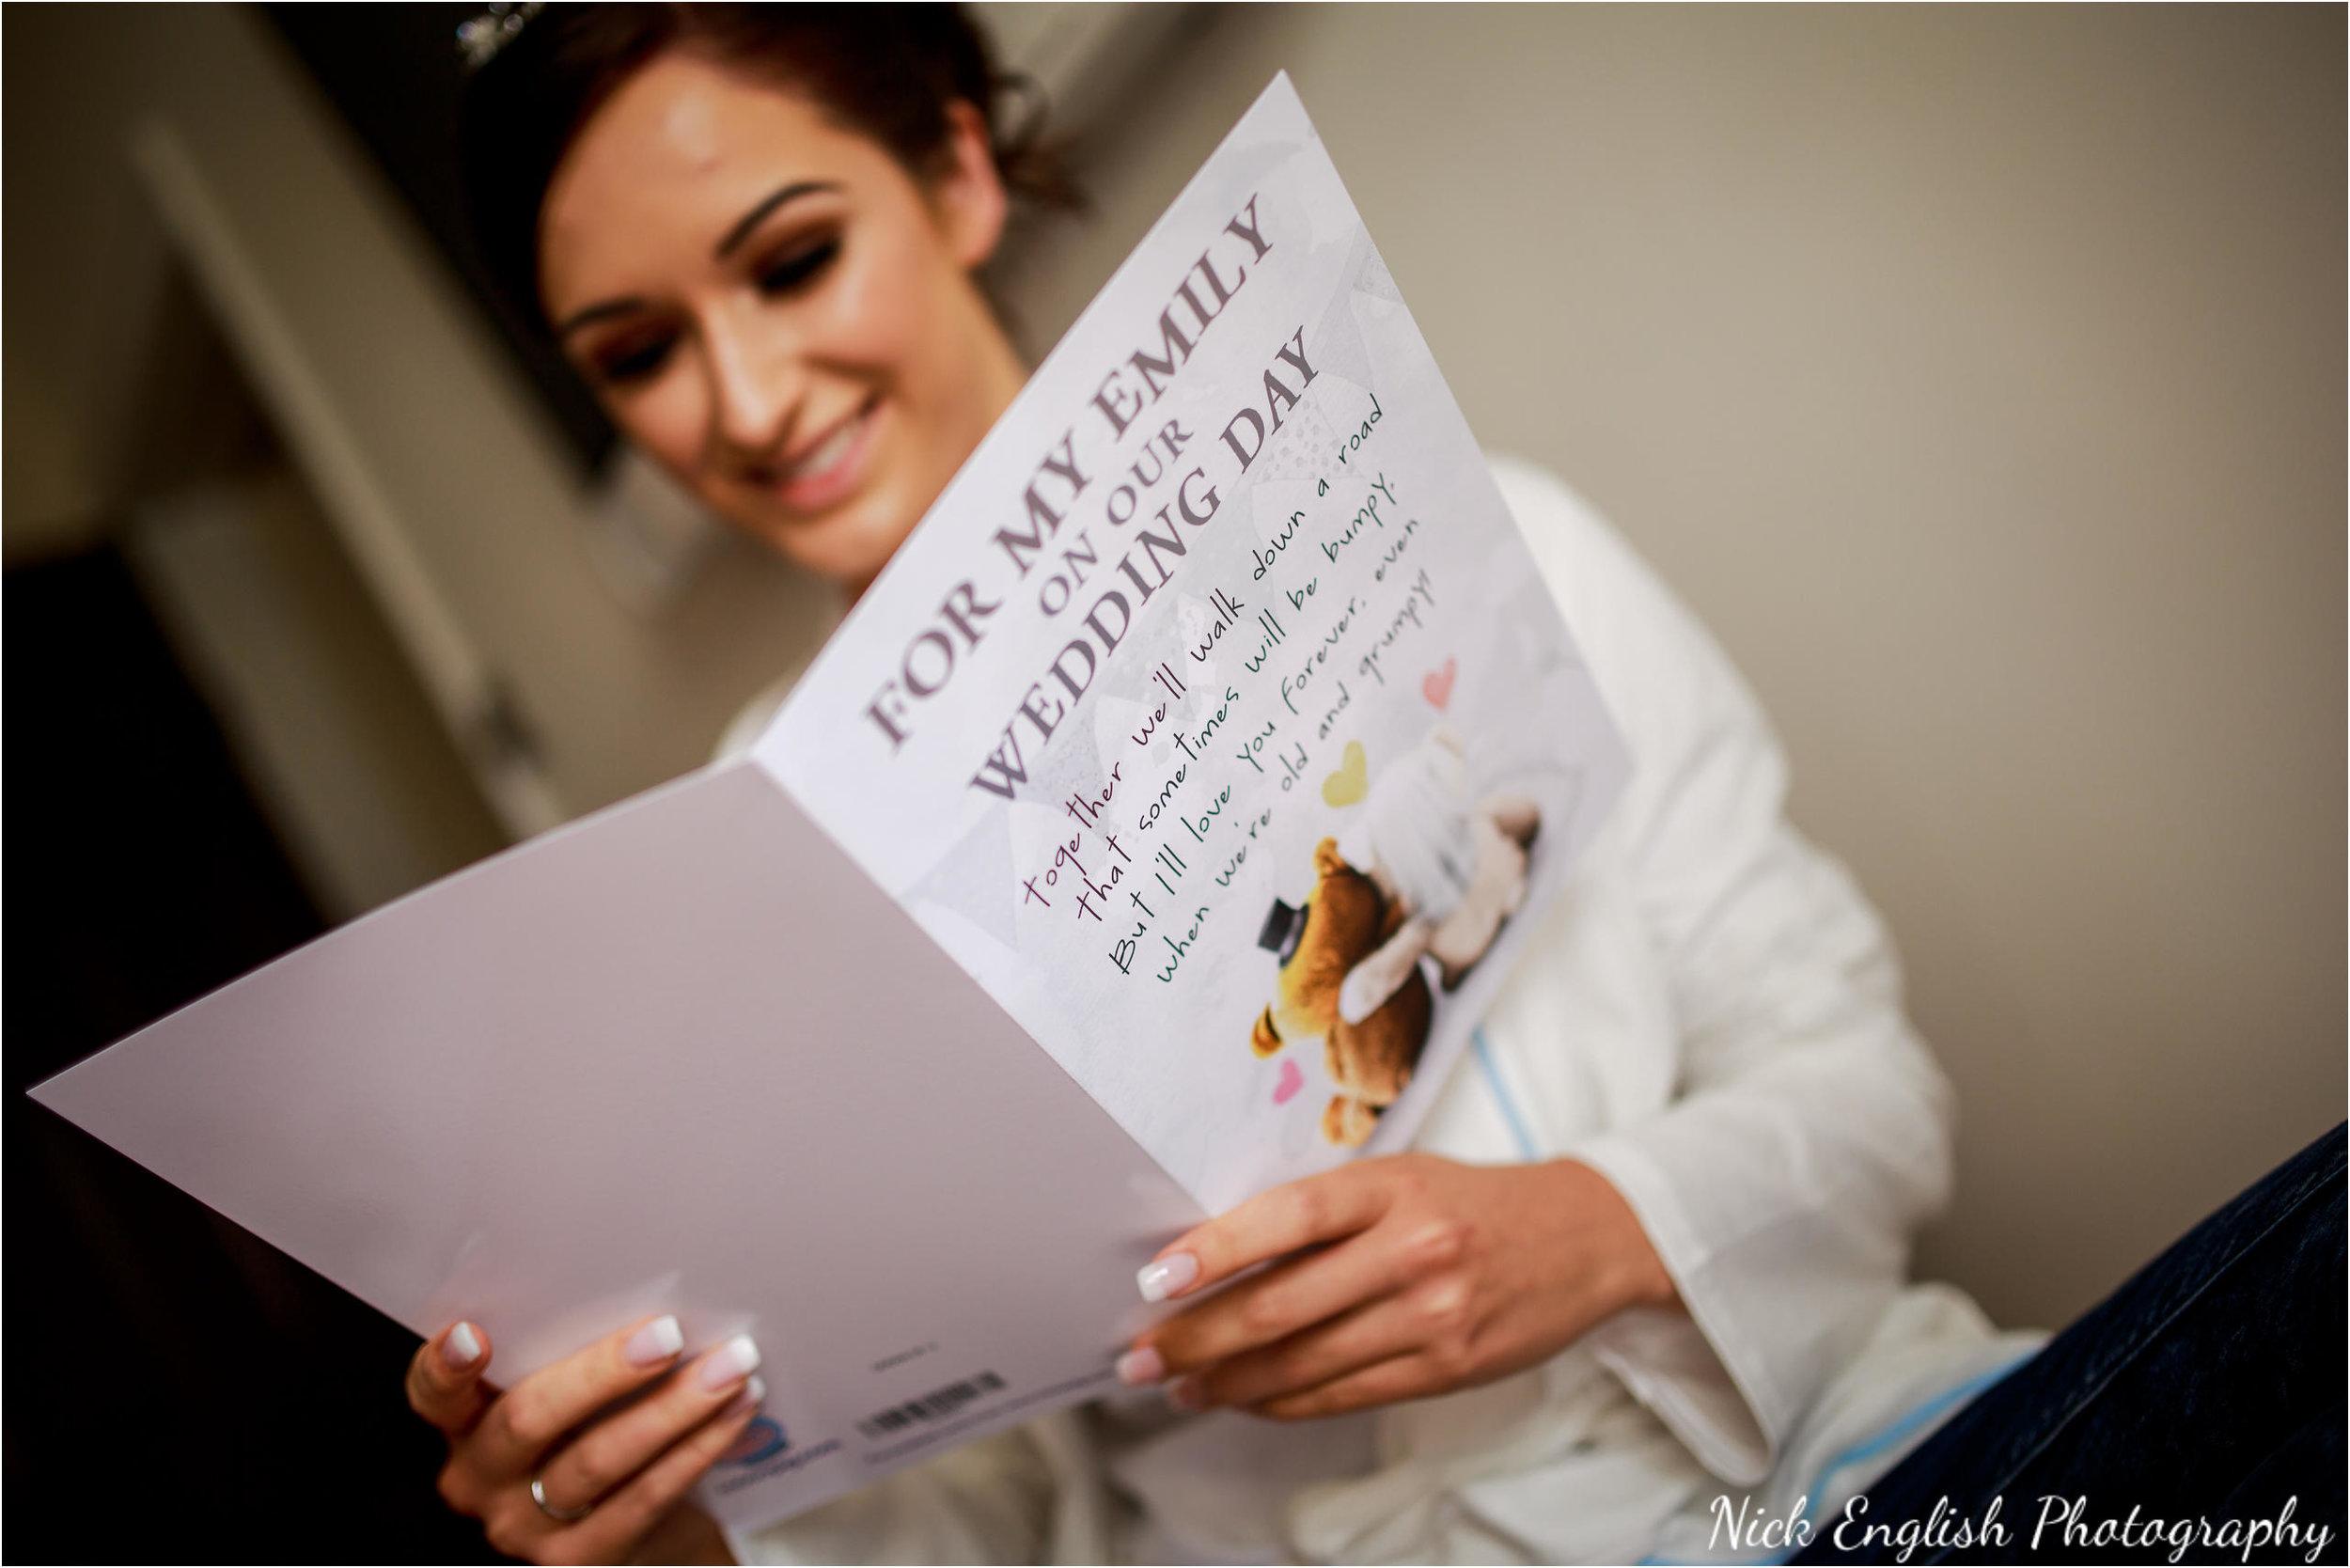 Emily David Wedding Photographs at Barton Grange Preston by Nick English Photography 18jpg.jpeg